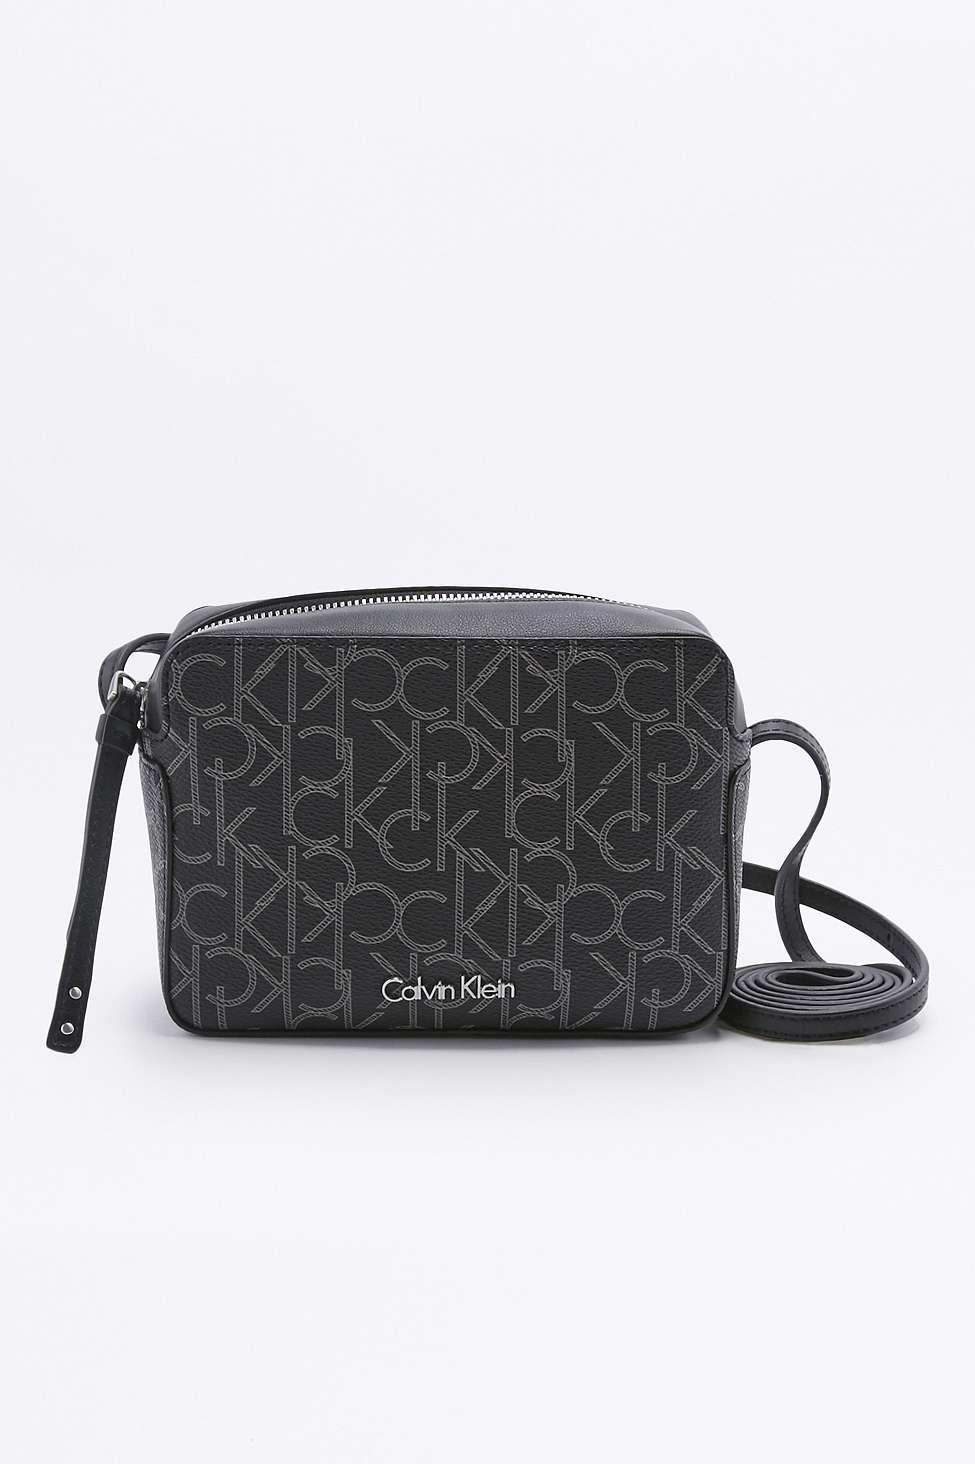 Calvin Klein Petit sac bandoulière